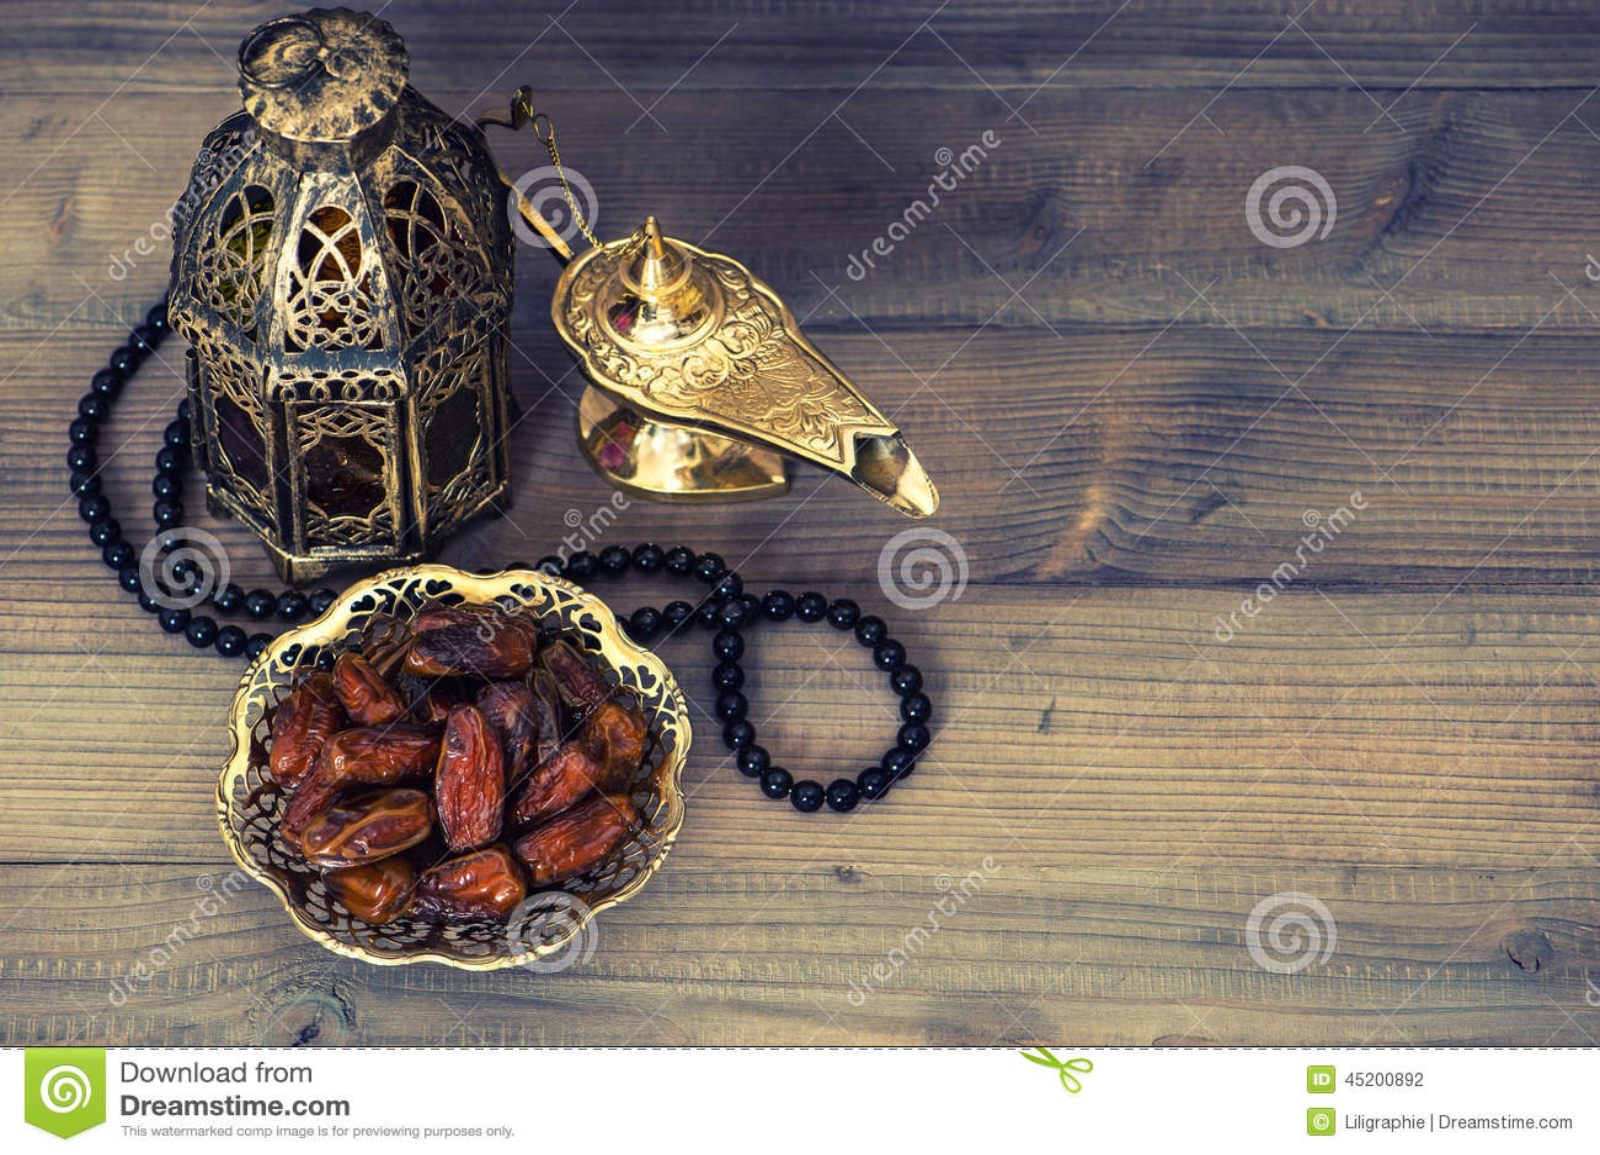 Daty, arabski lampion i różaniec, dekoracja ramadan